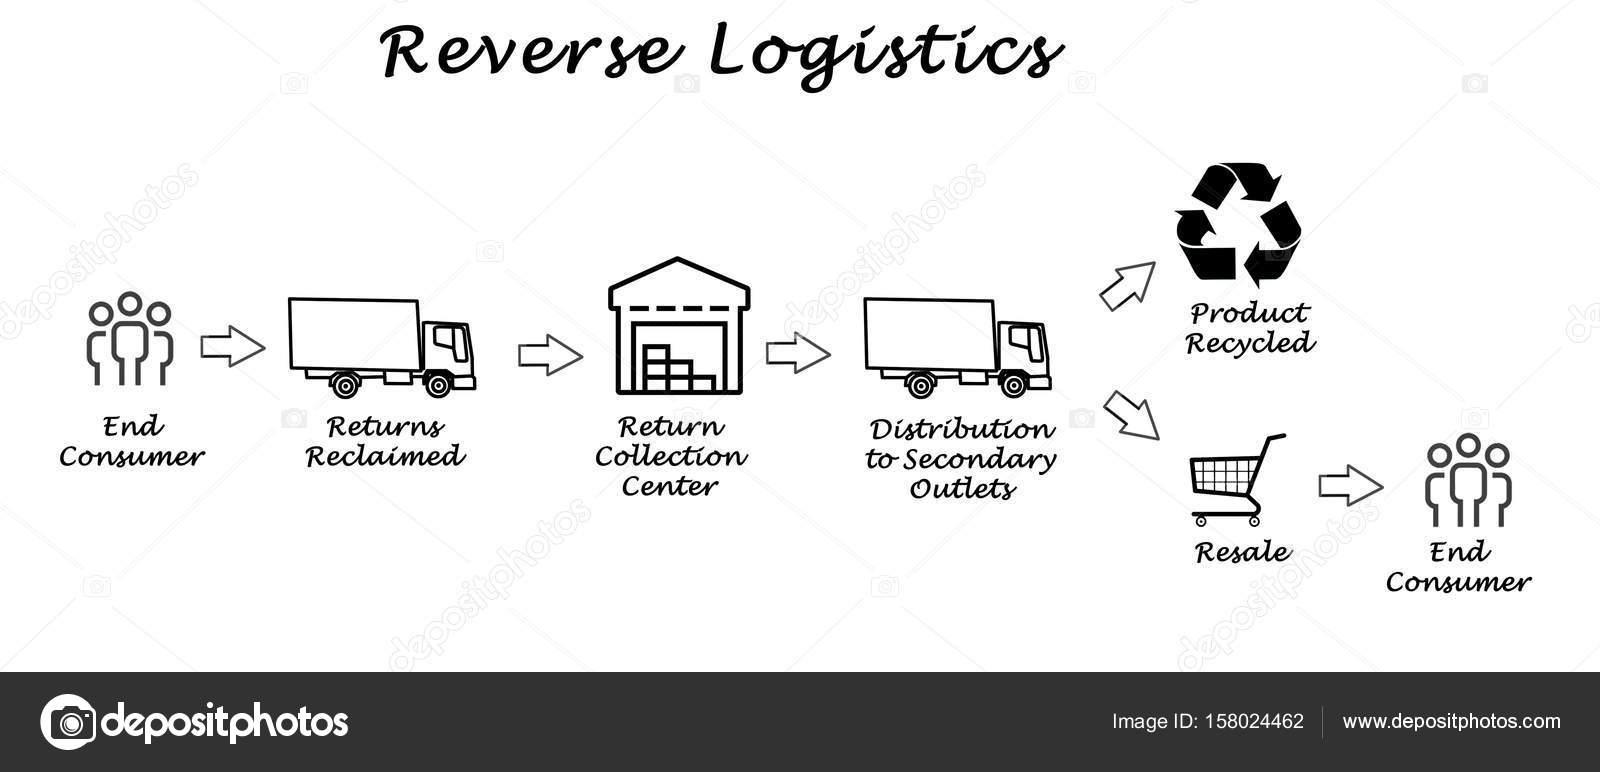 Diagrama de logstica reversa stock photo vaeenma 158024462 diagrama de logstica reversa foto de vaeenma ccuart Gallery